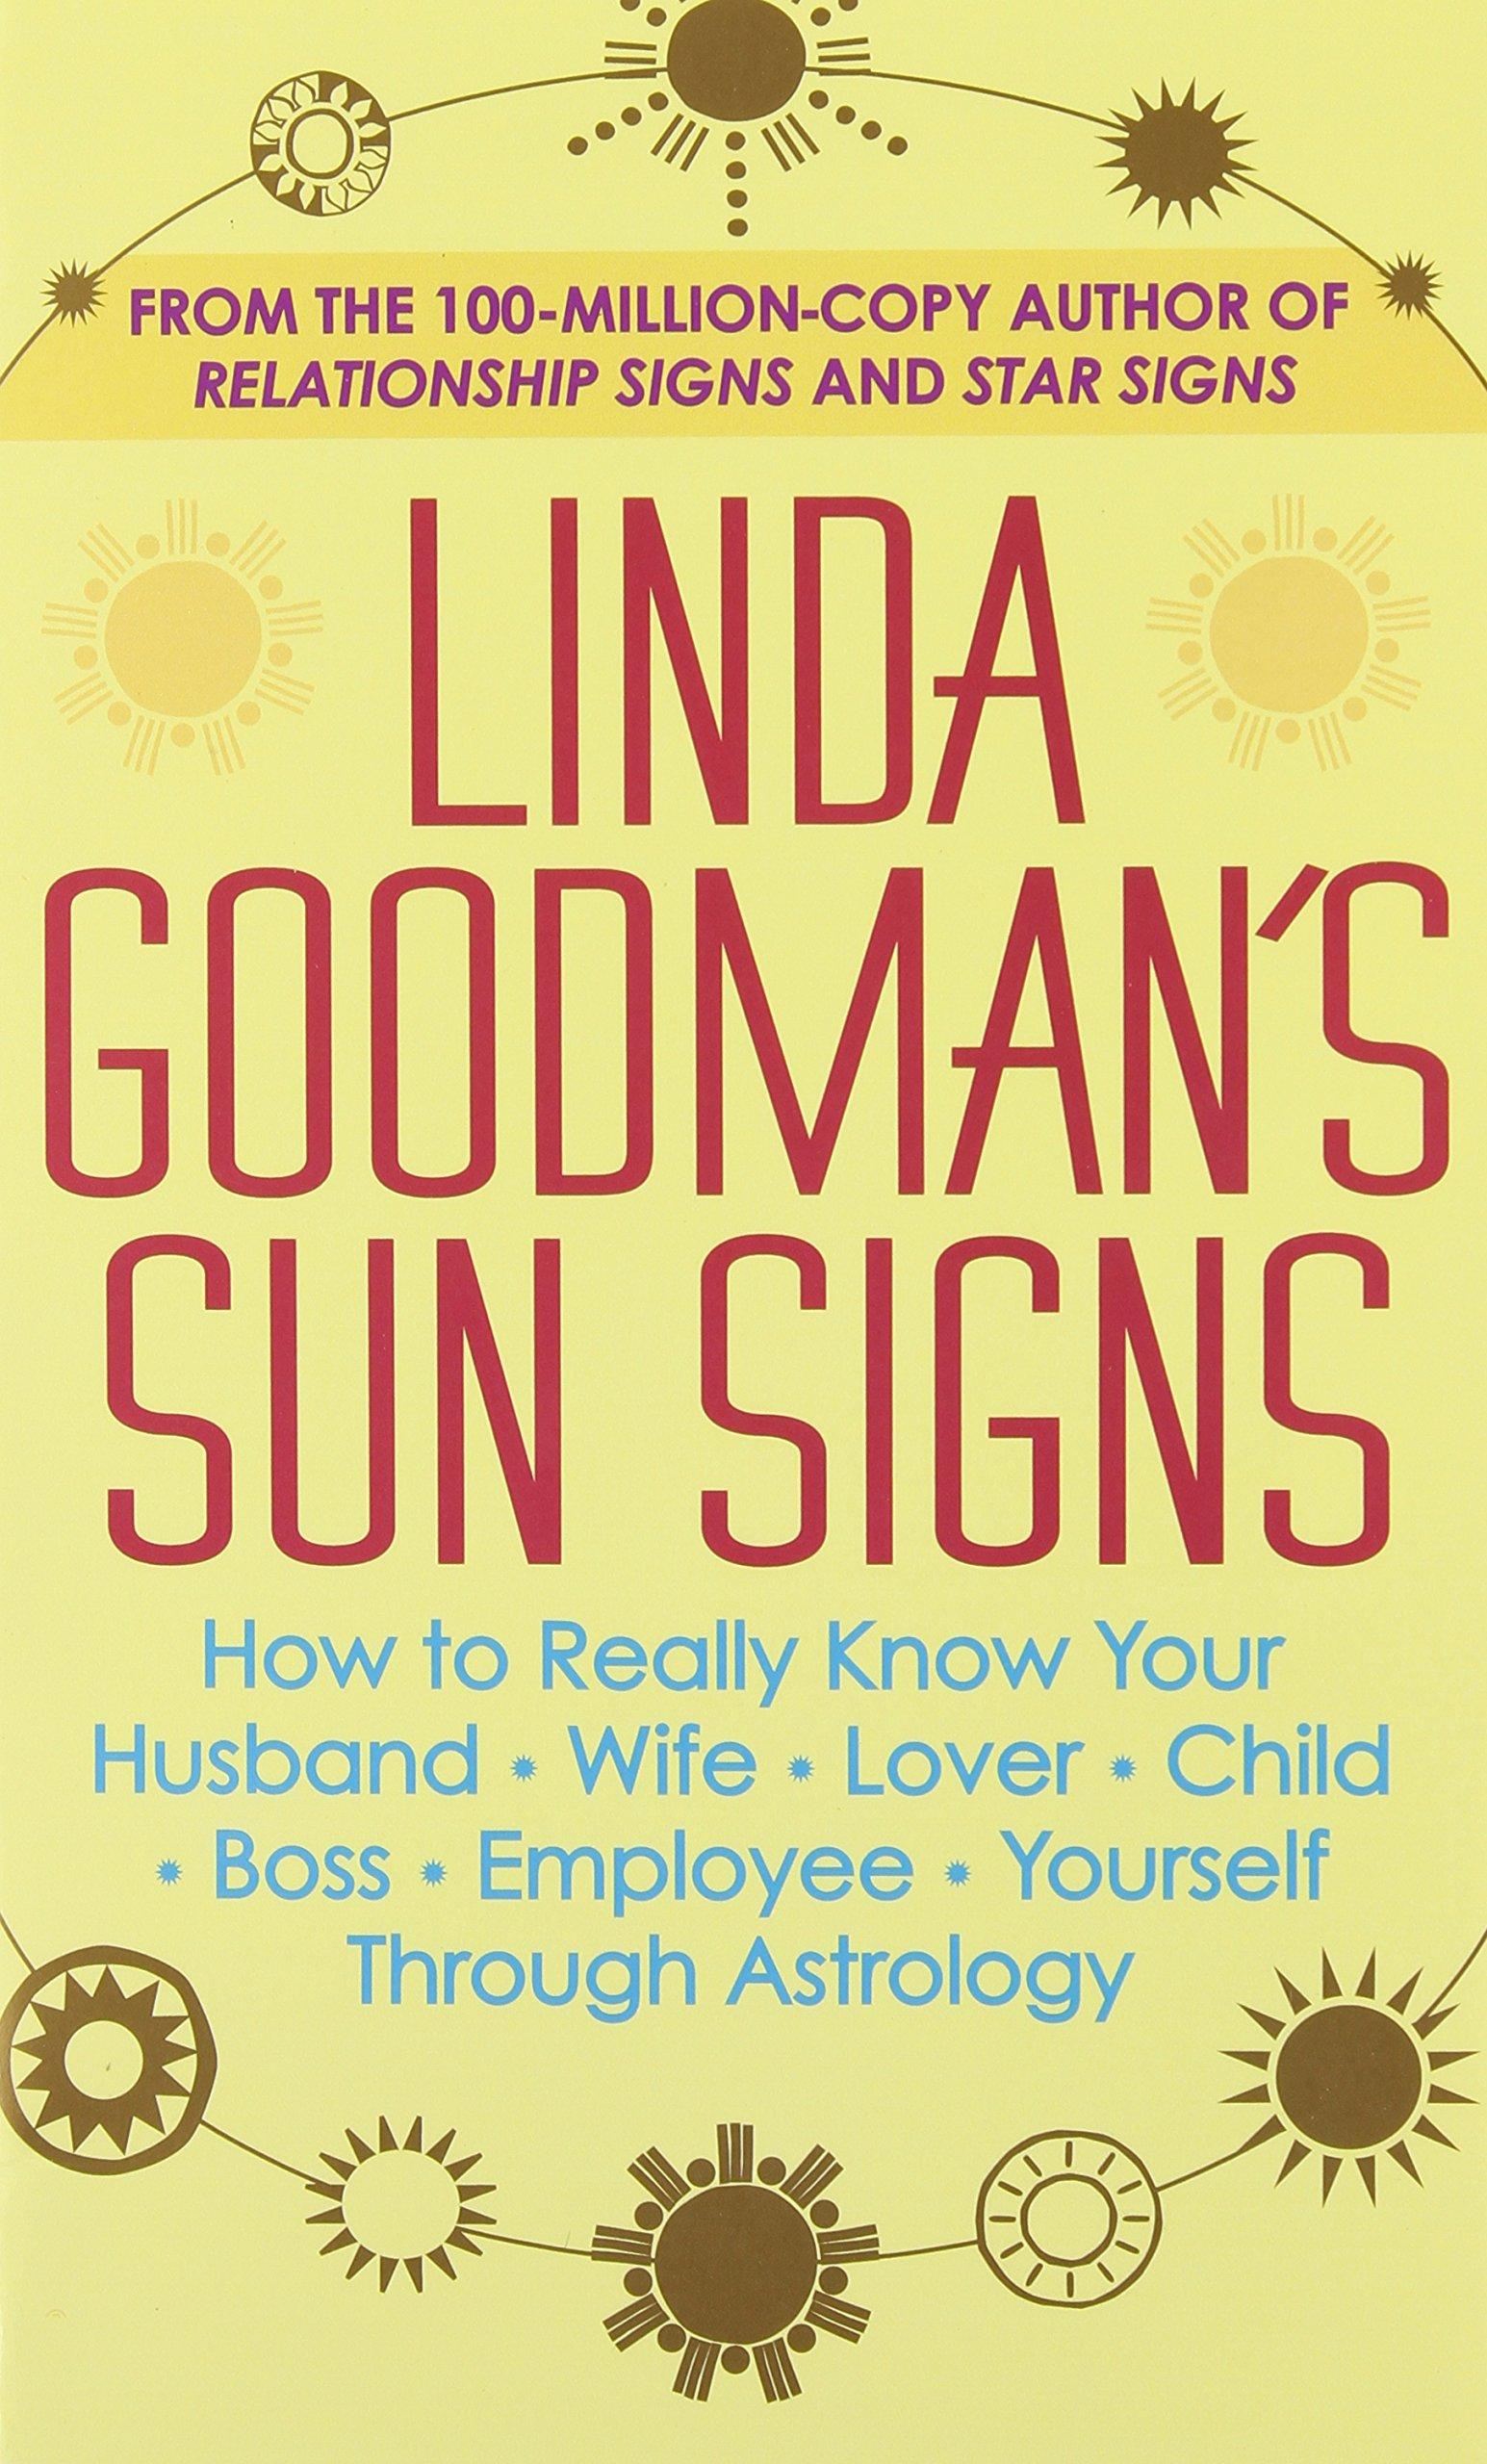 Linda Goodman's Sun Signs by Bantam